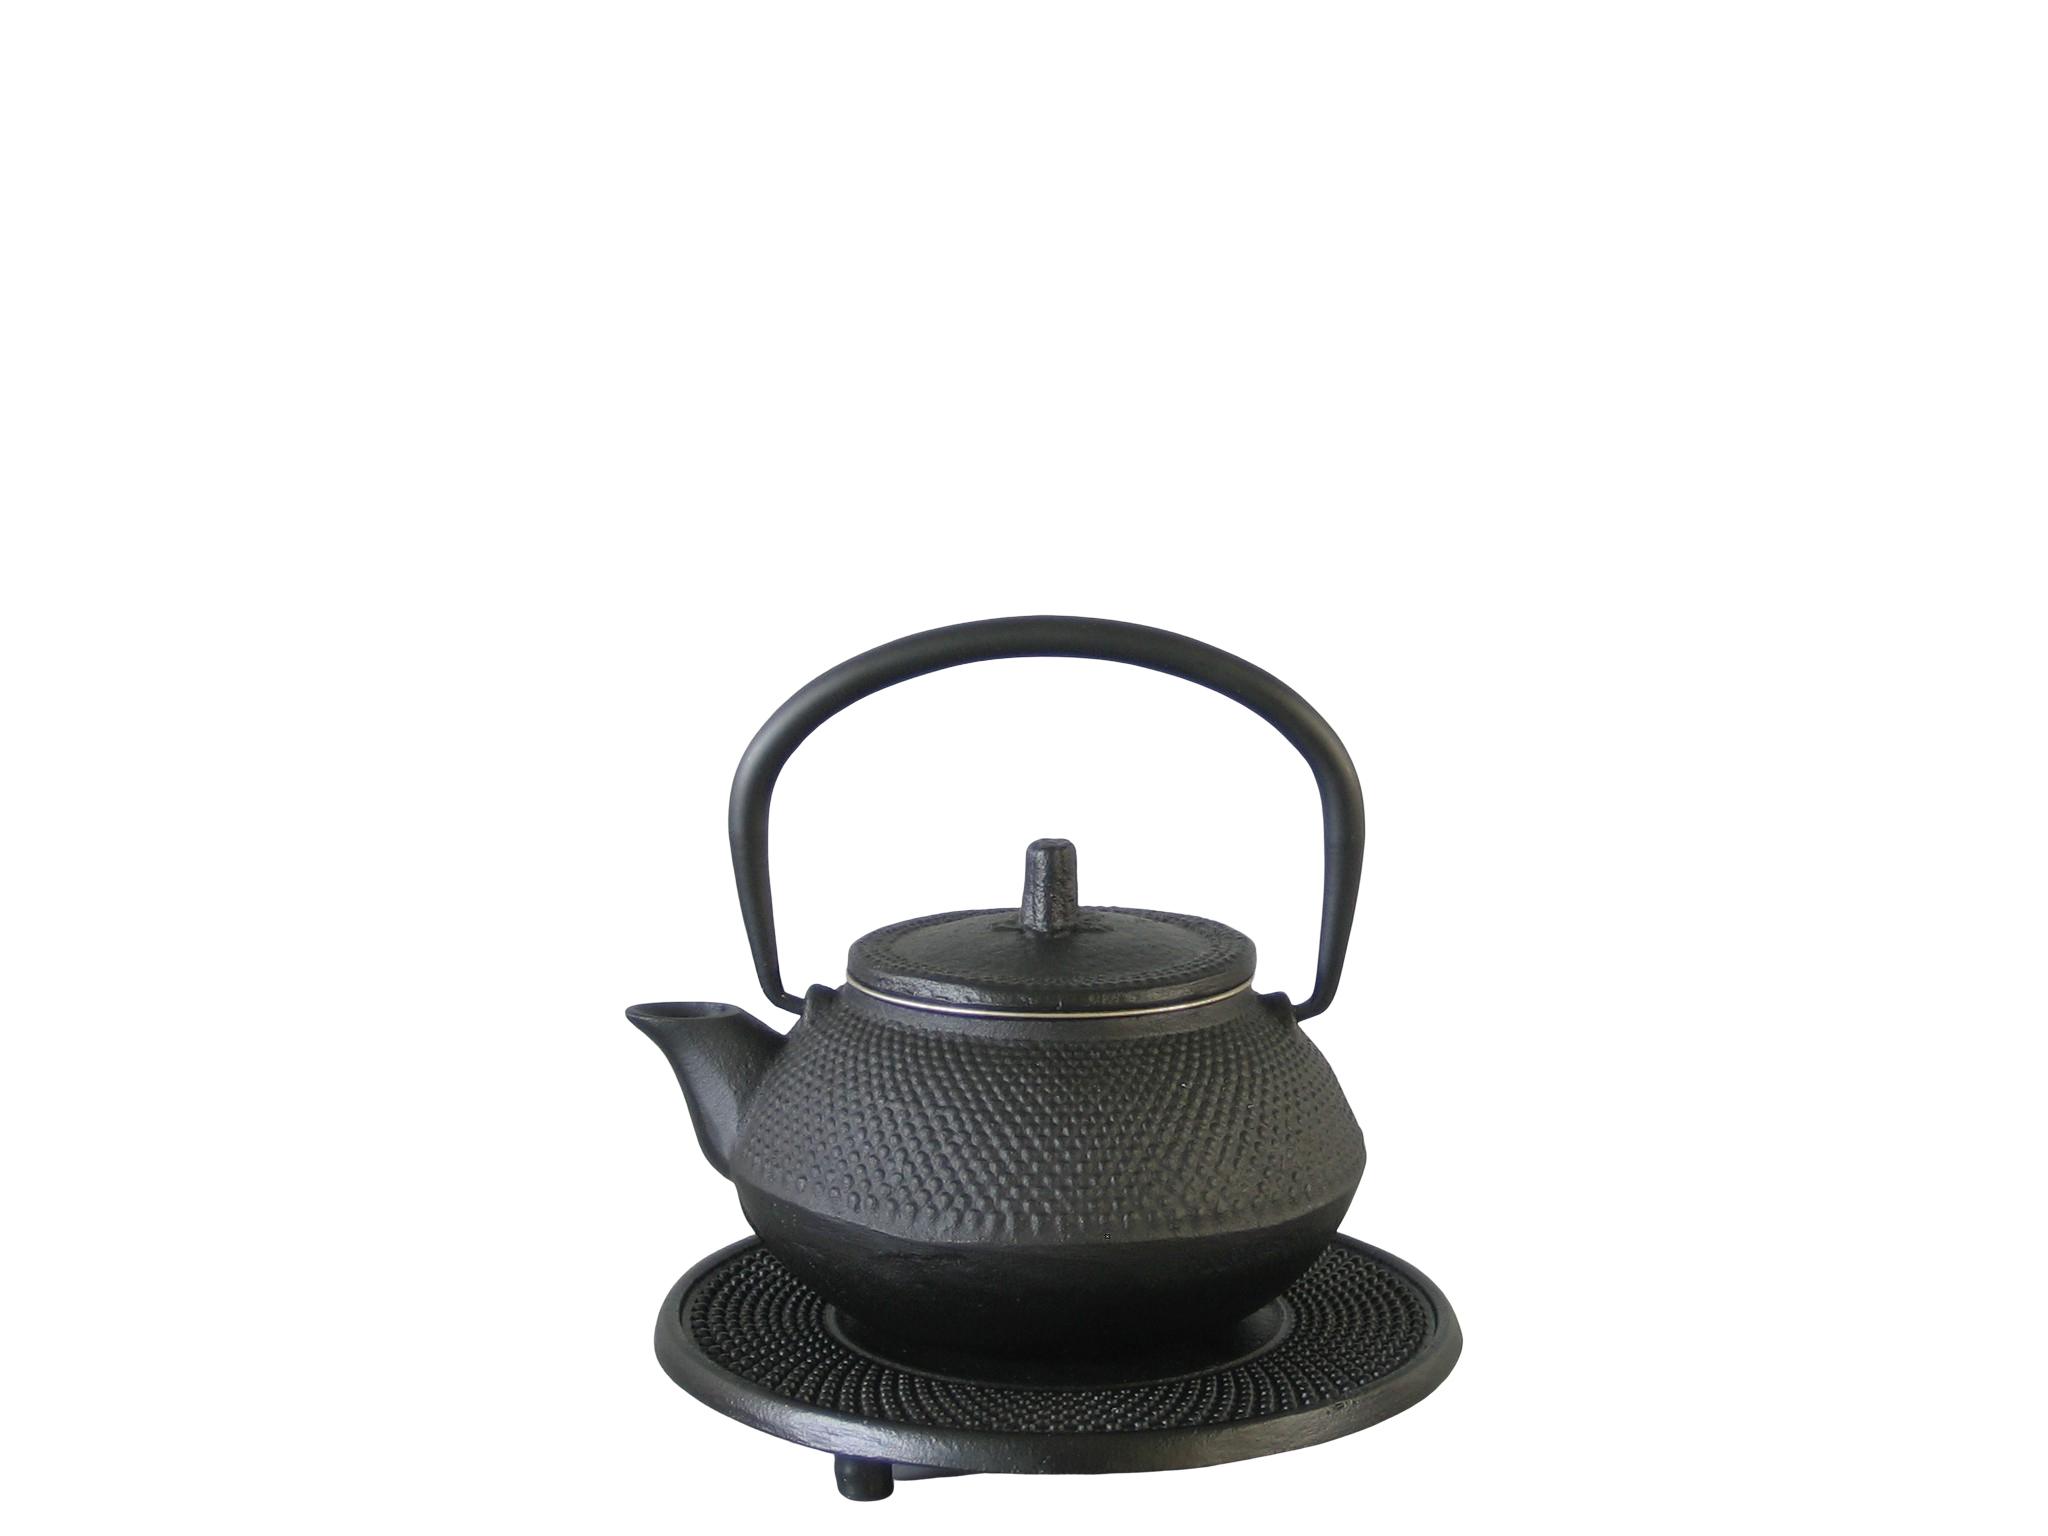 KOBE030 - Cast iron teapot enameled interior 0.30 L - Green Leaf